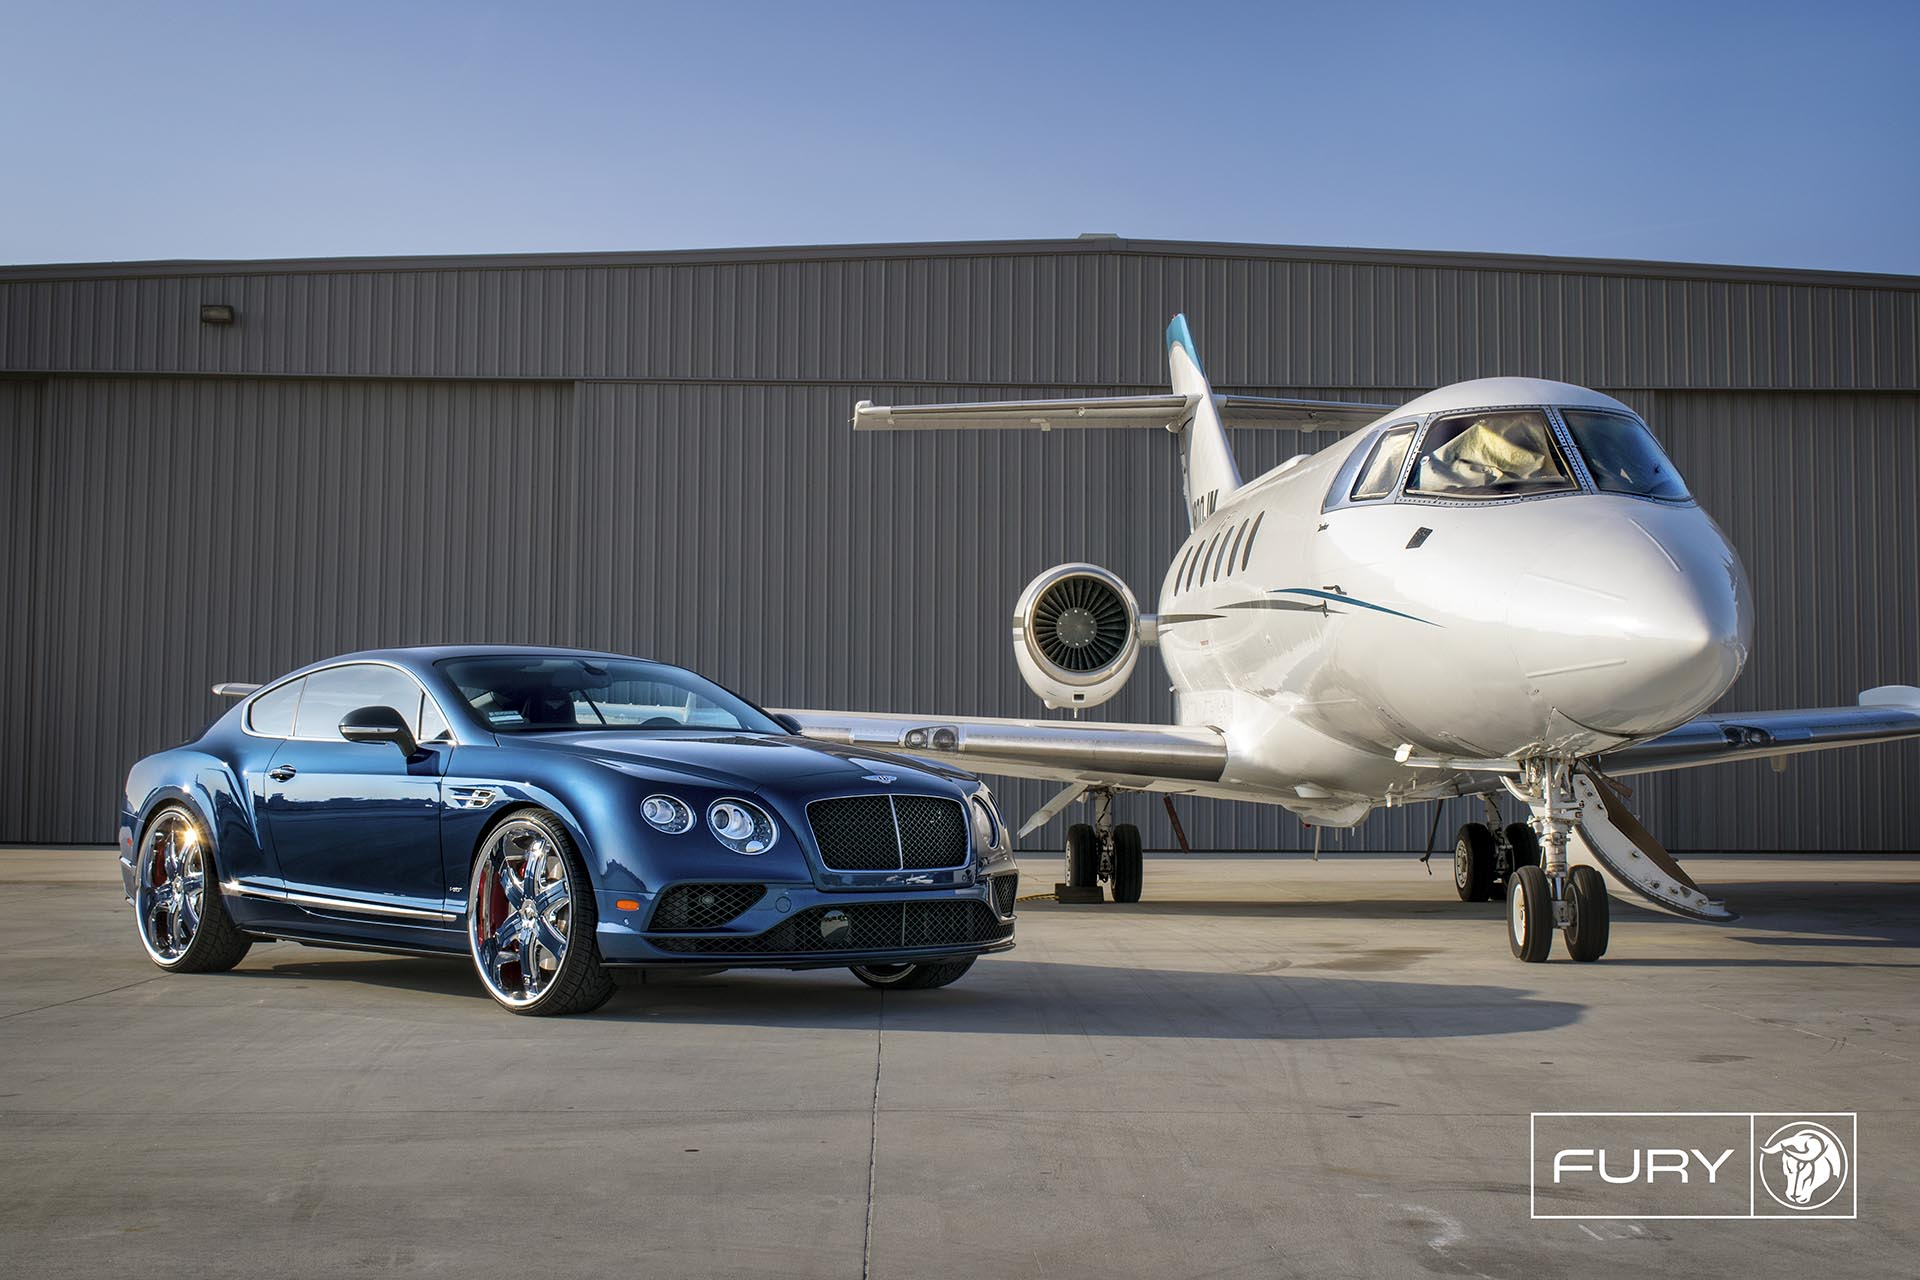 Chrome Diablo Fury Wheels on a Bentley Continental - Featuring Lina Posada